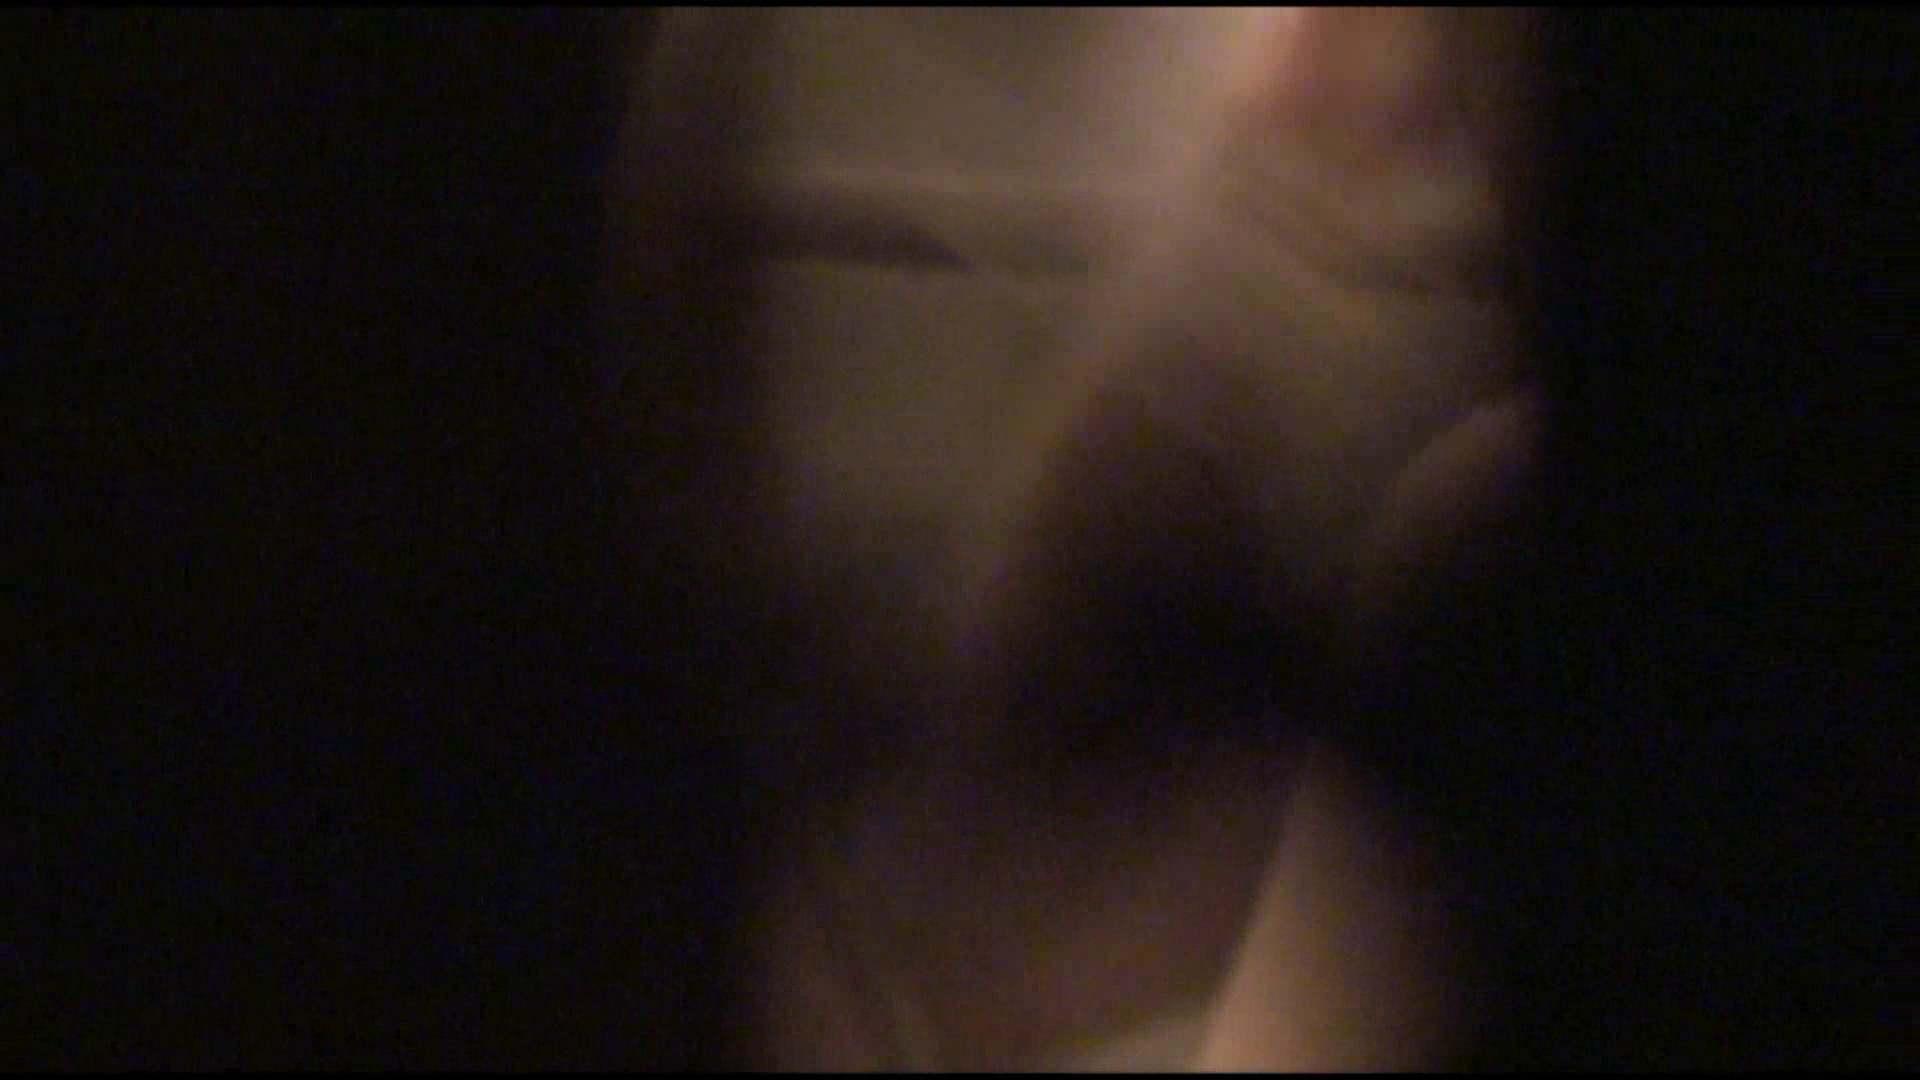 vol.05最高の極上美人!可愛い彼女の裸体をどうぞ!風呂上り鏡チェックも必見! 美人  99PIX 99